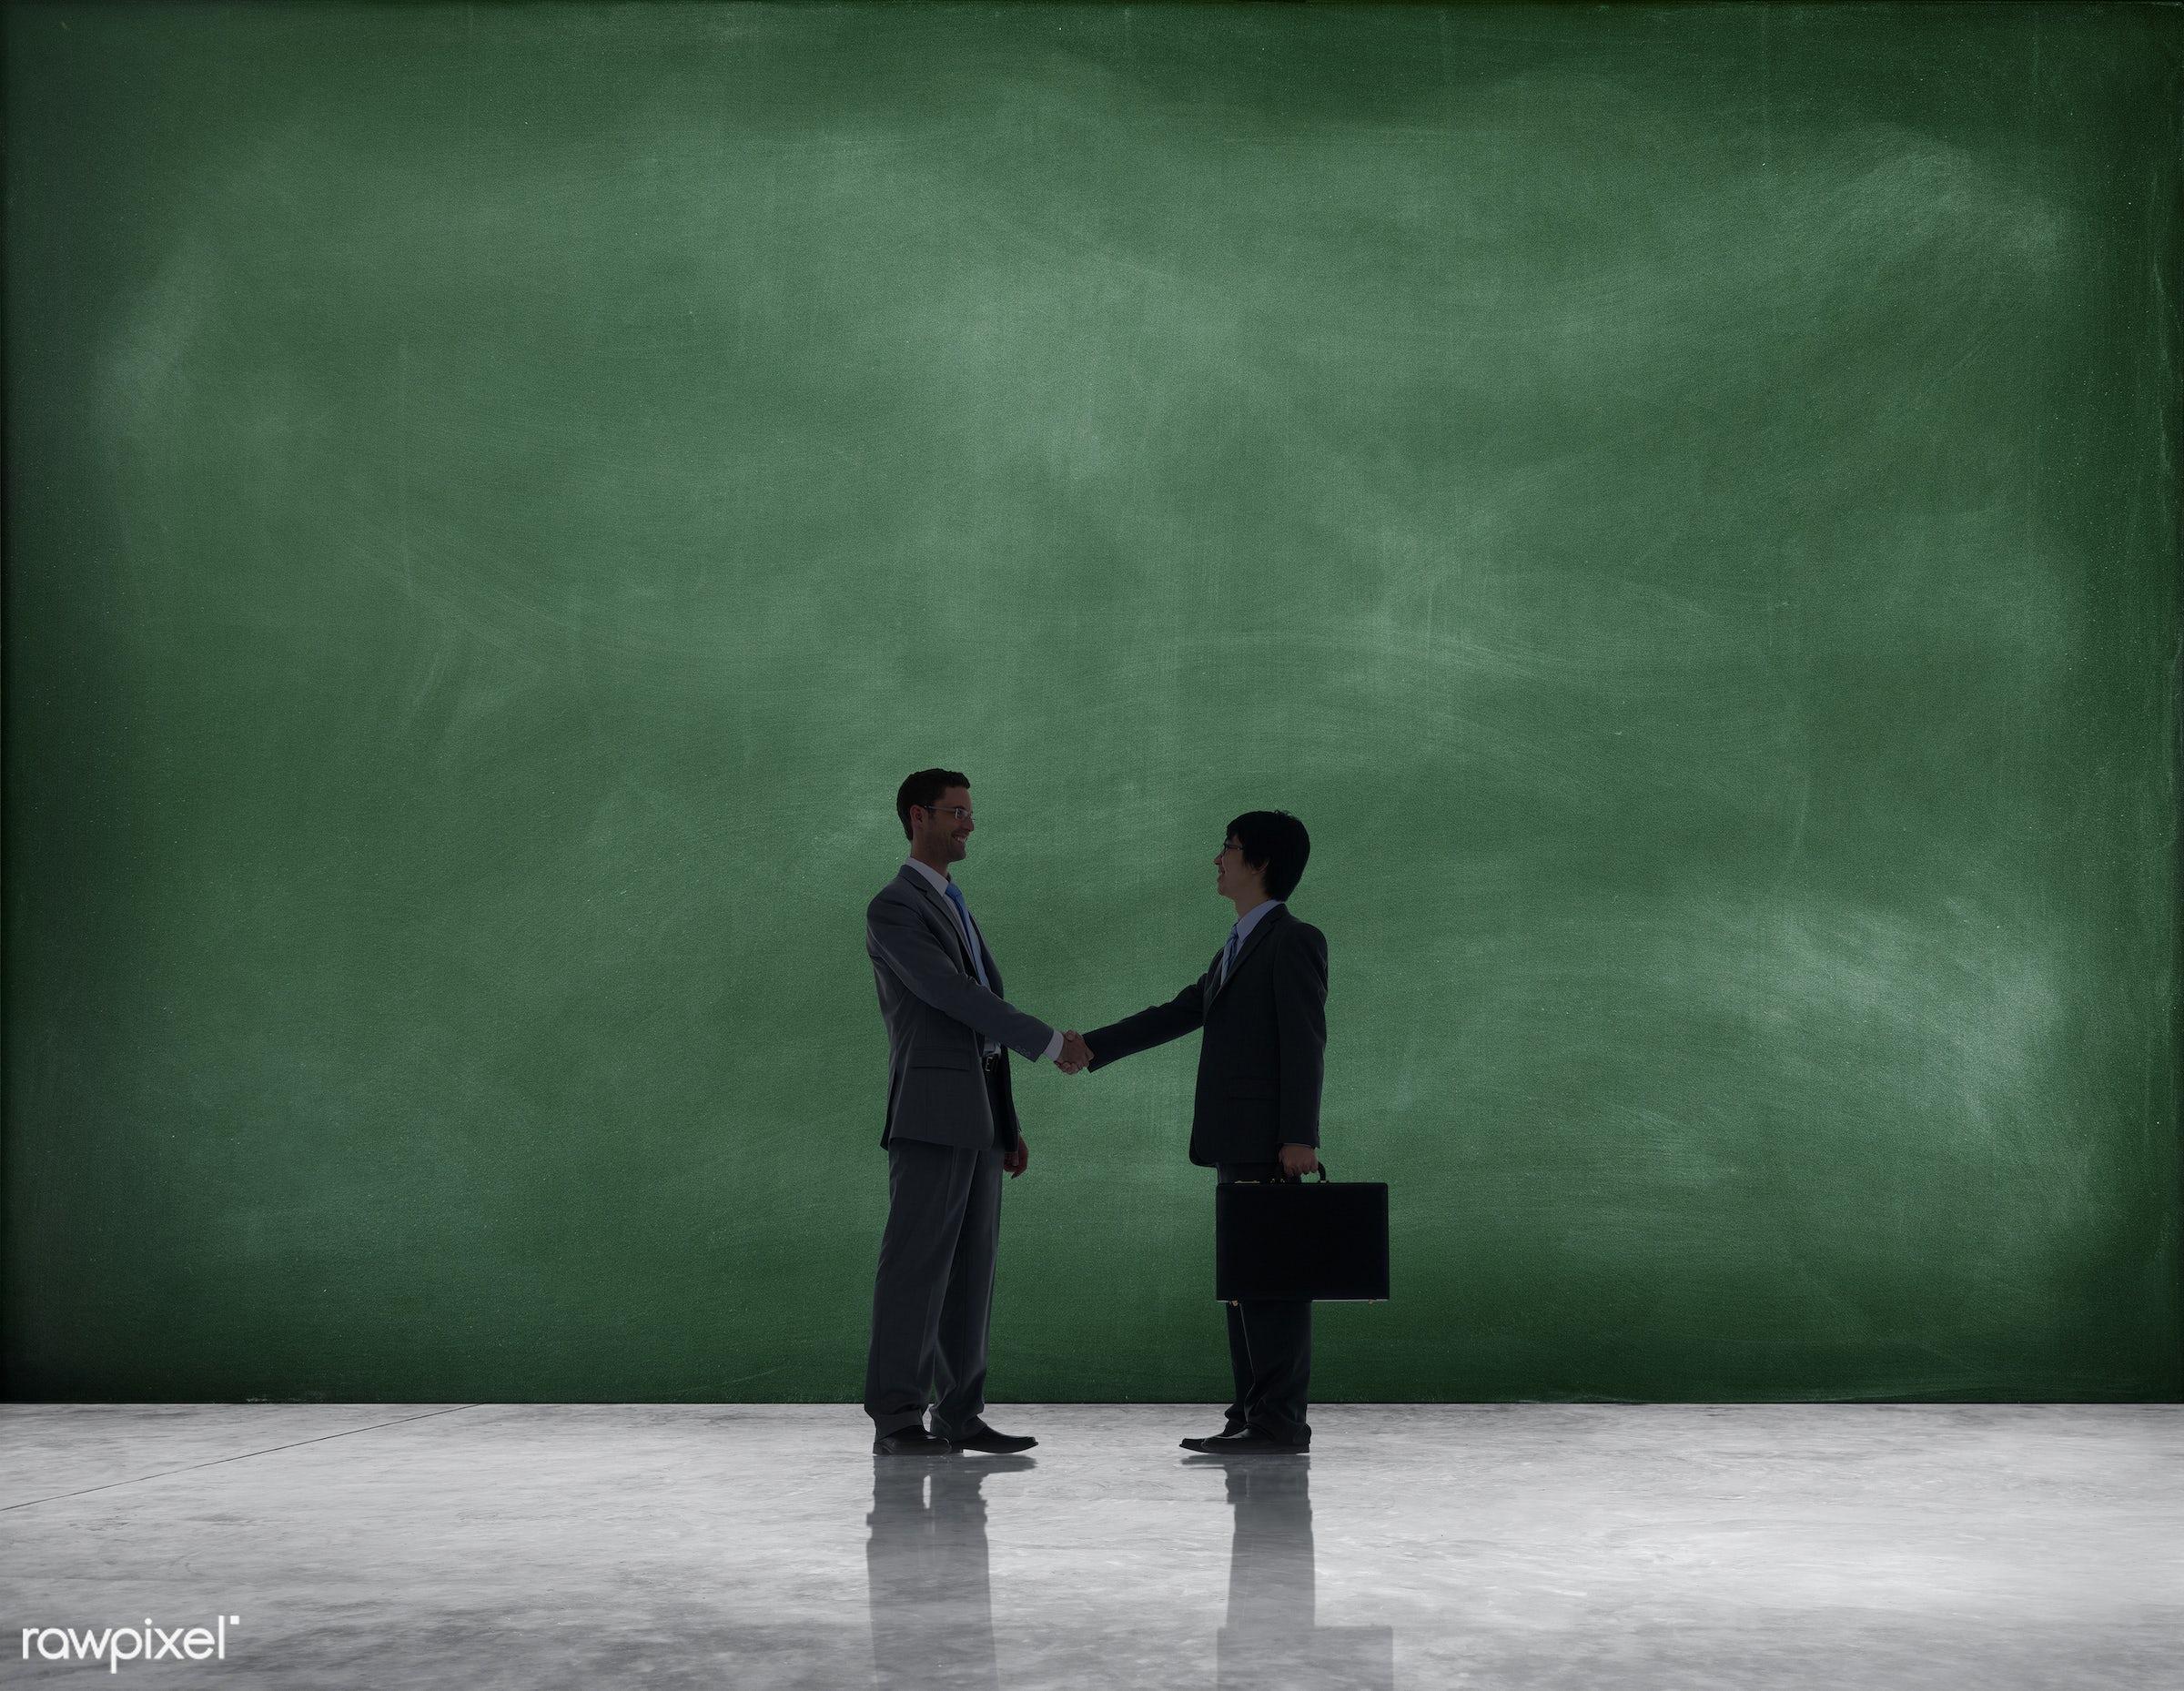 congratulating, acknowledge, agreement, approval, back lit, backgrounds, backlit, blackboard, business deal, business...